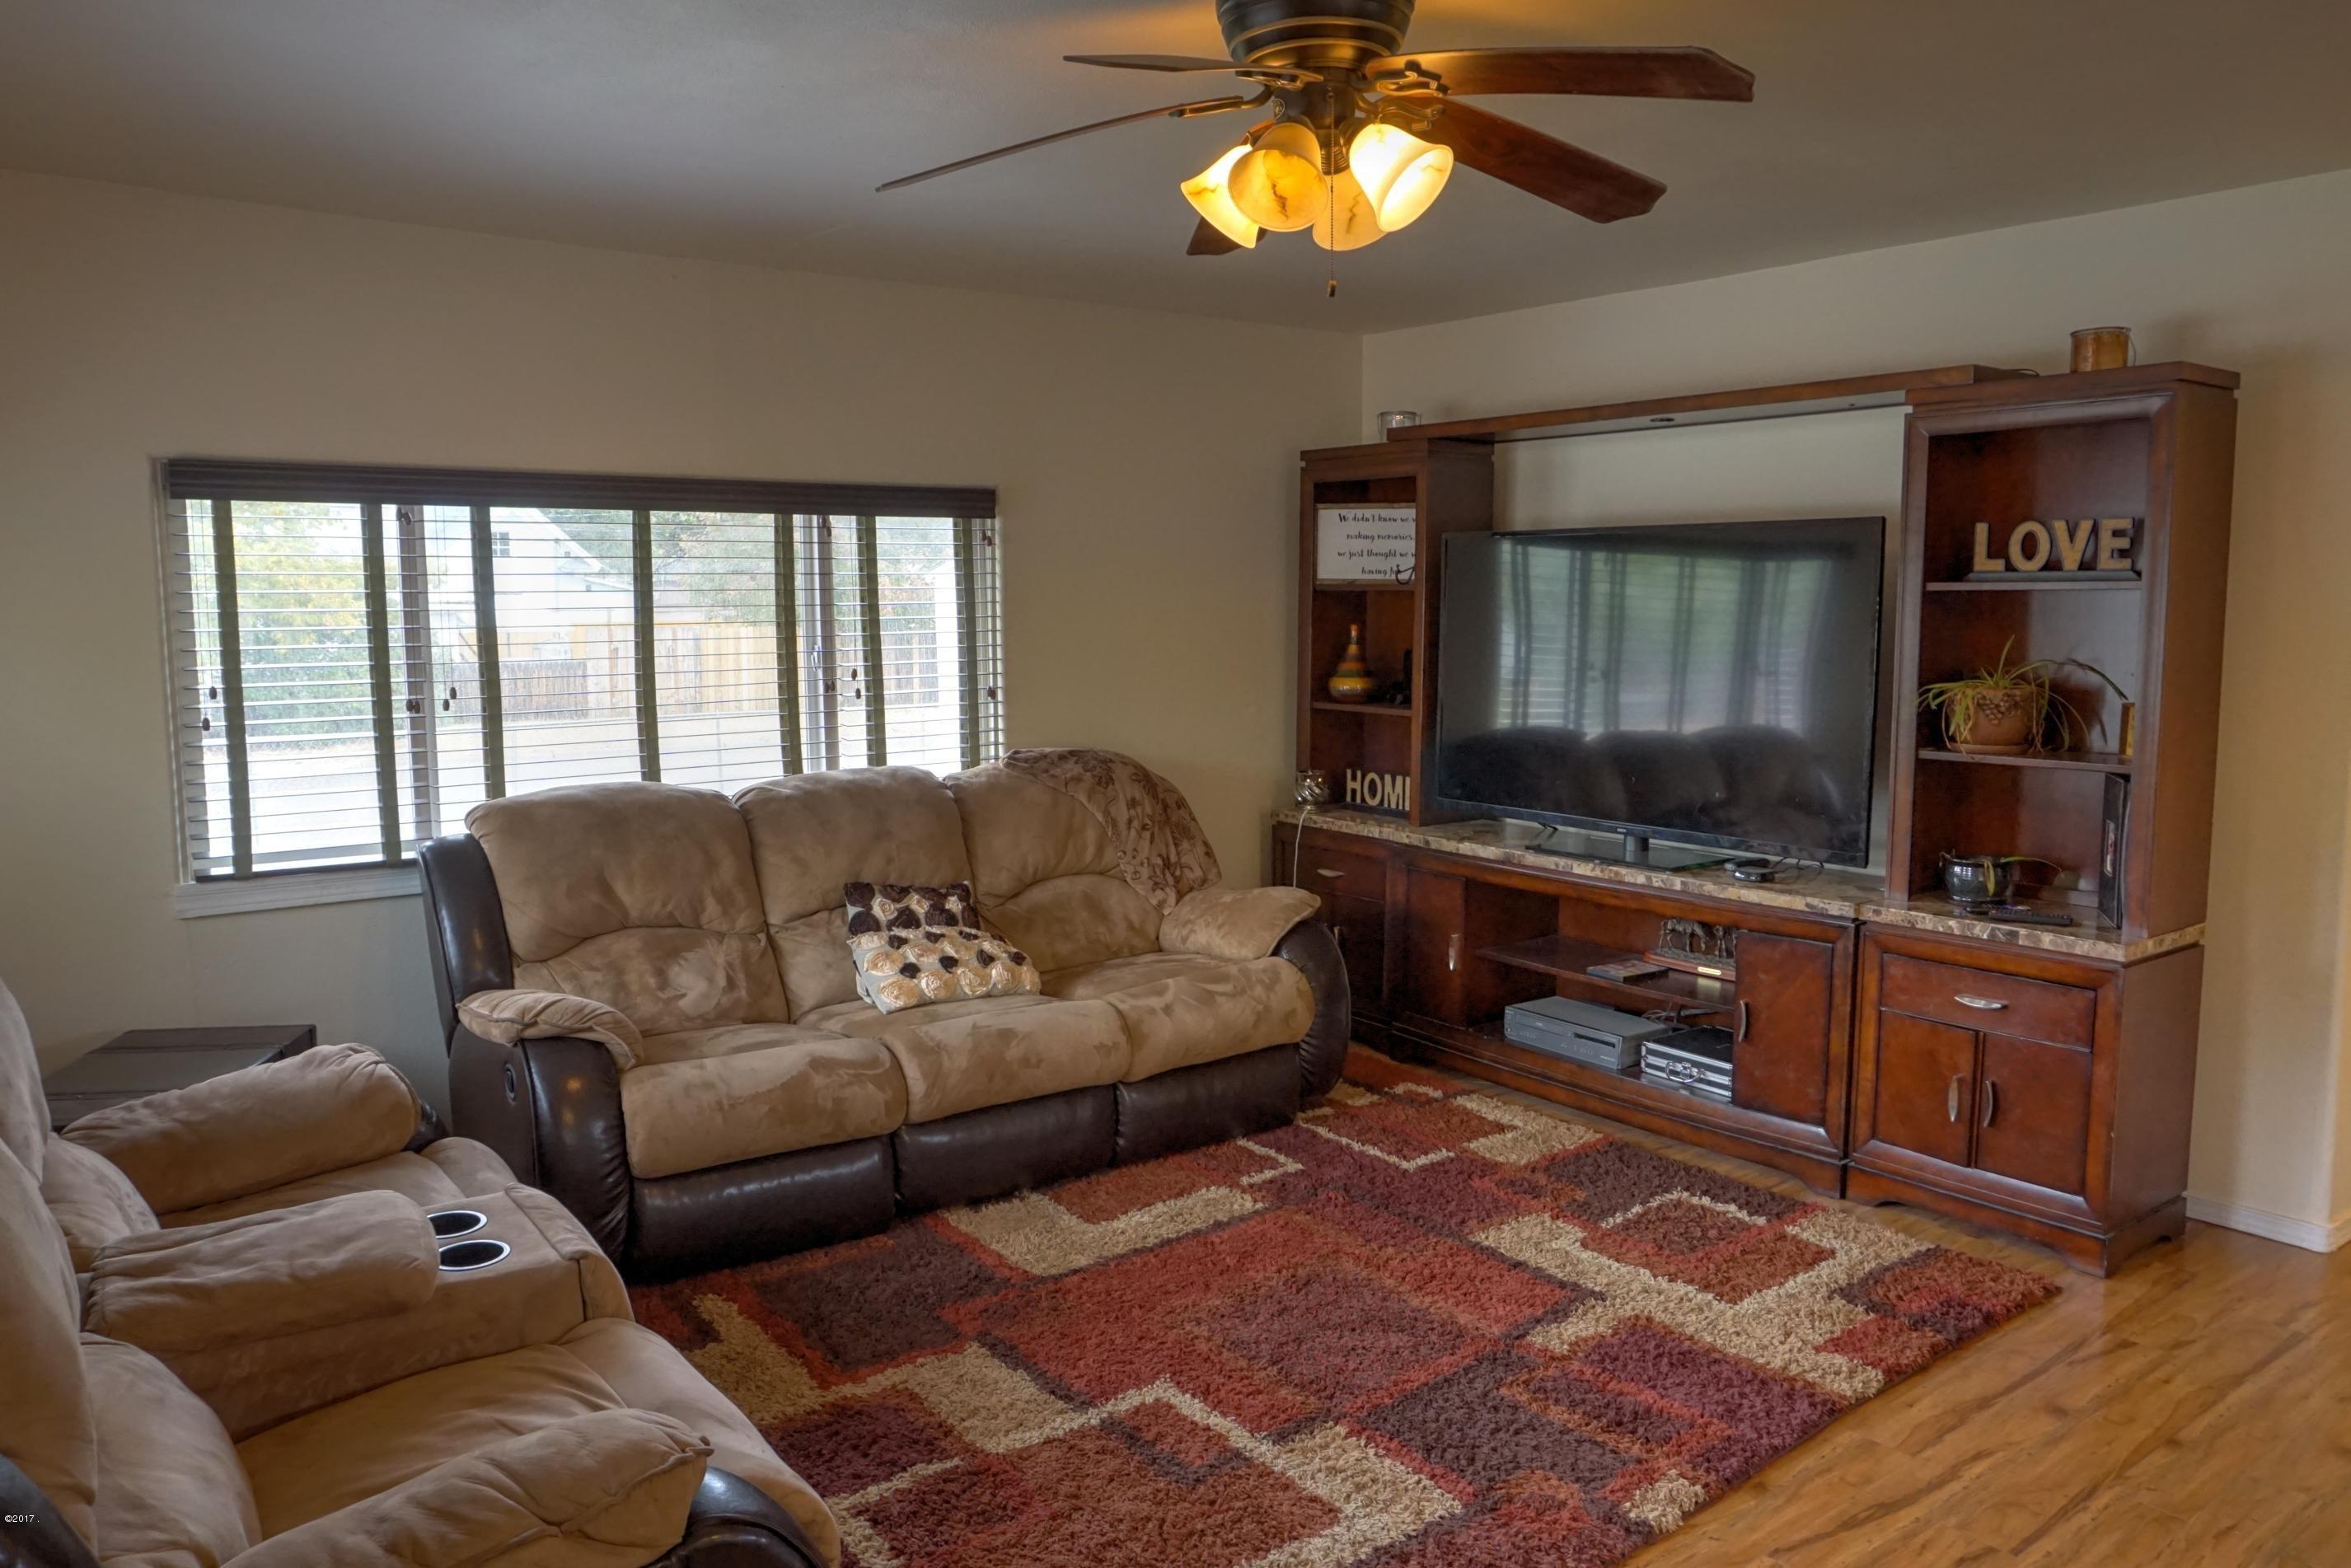 901 Defoe Street, Missoula, MT 59802